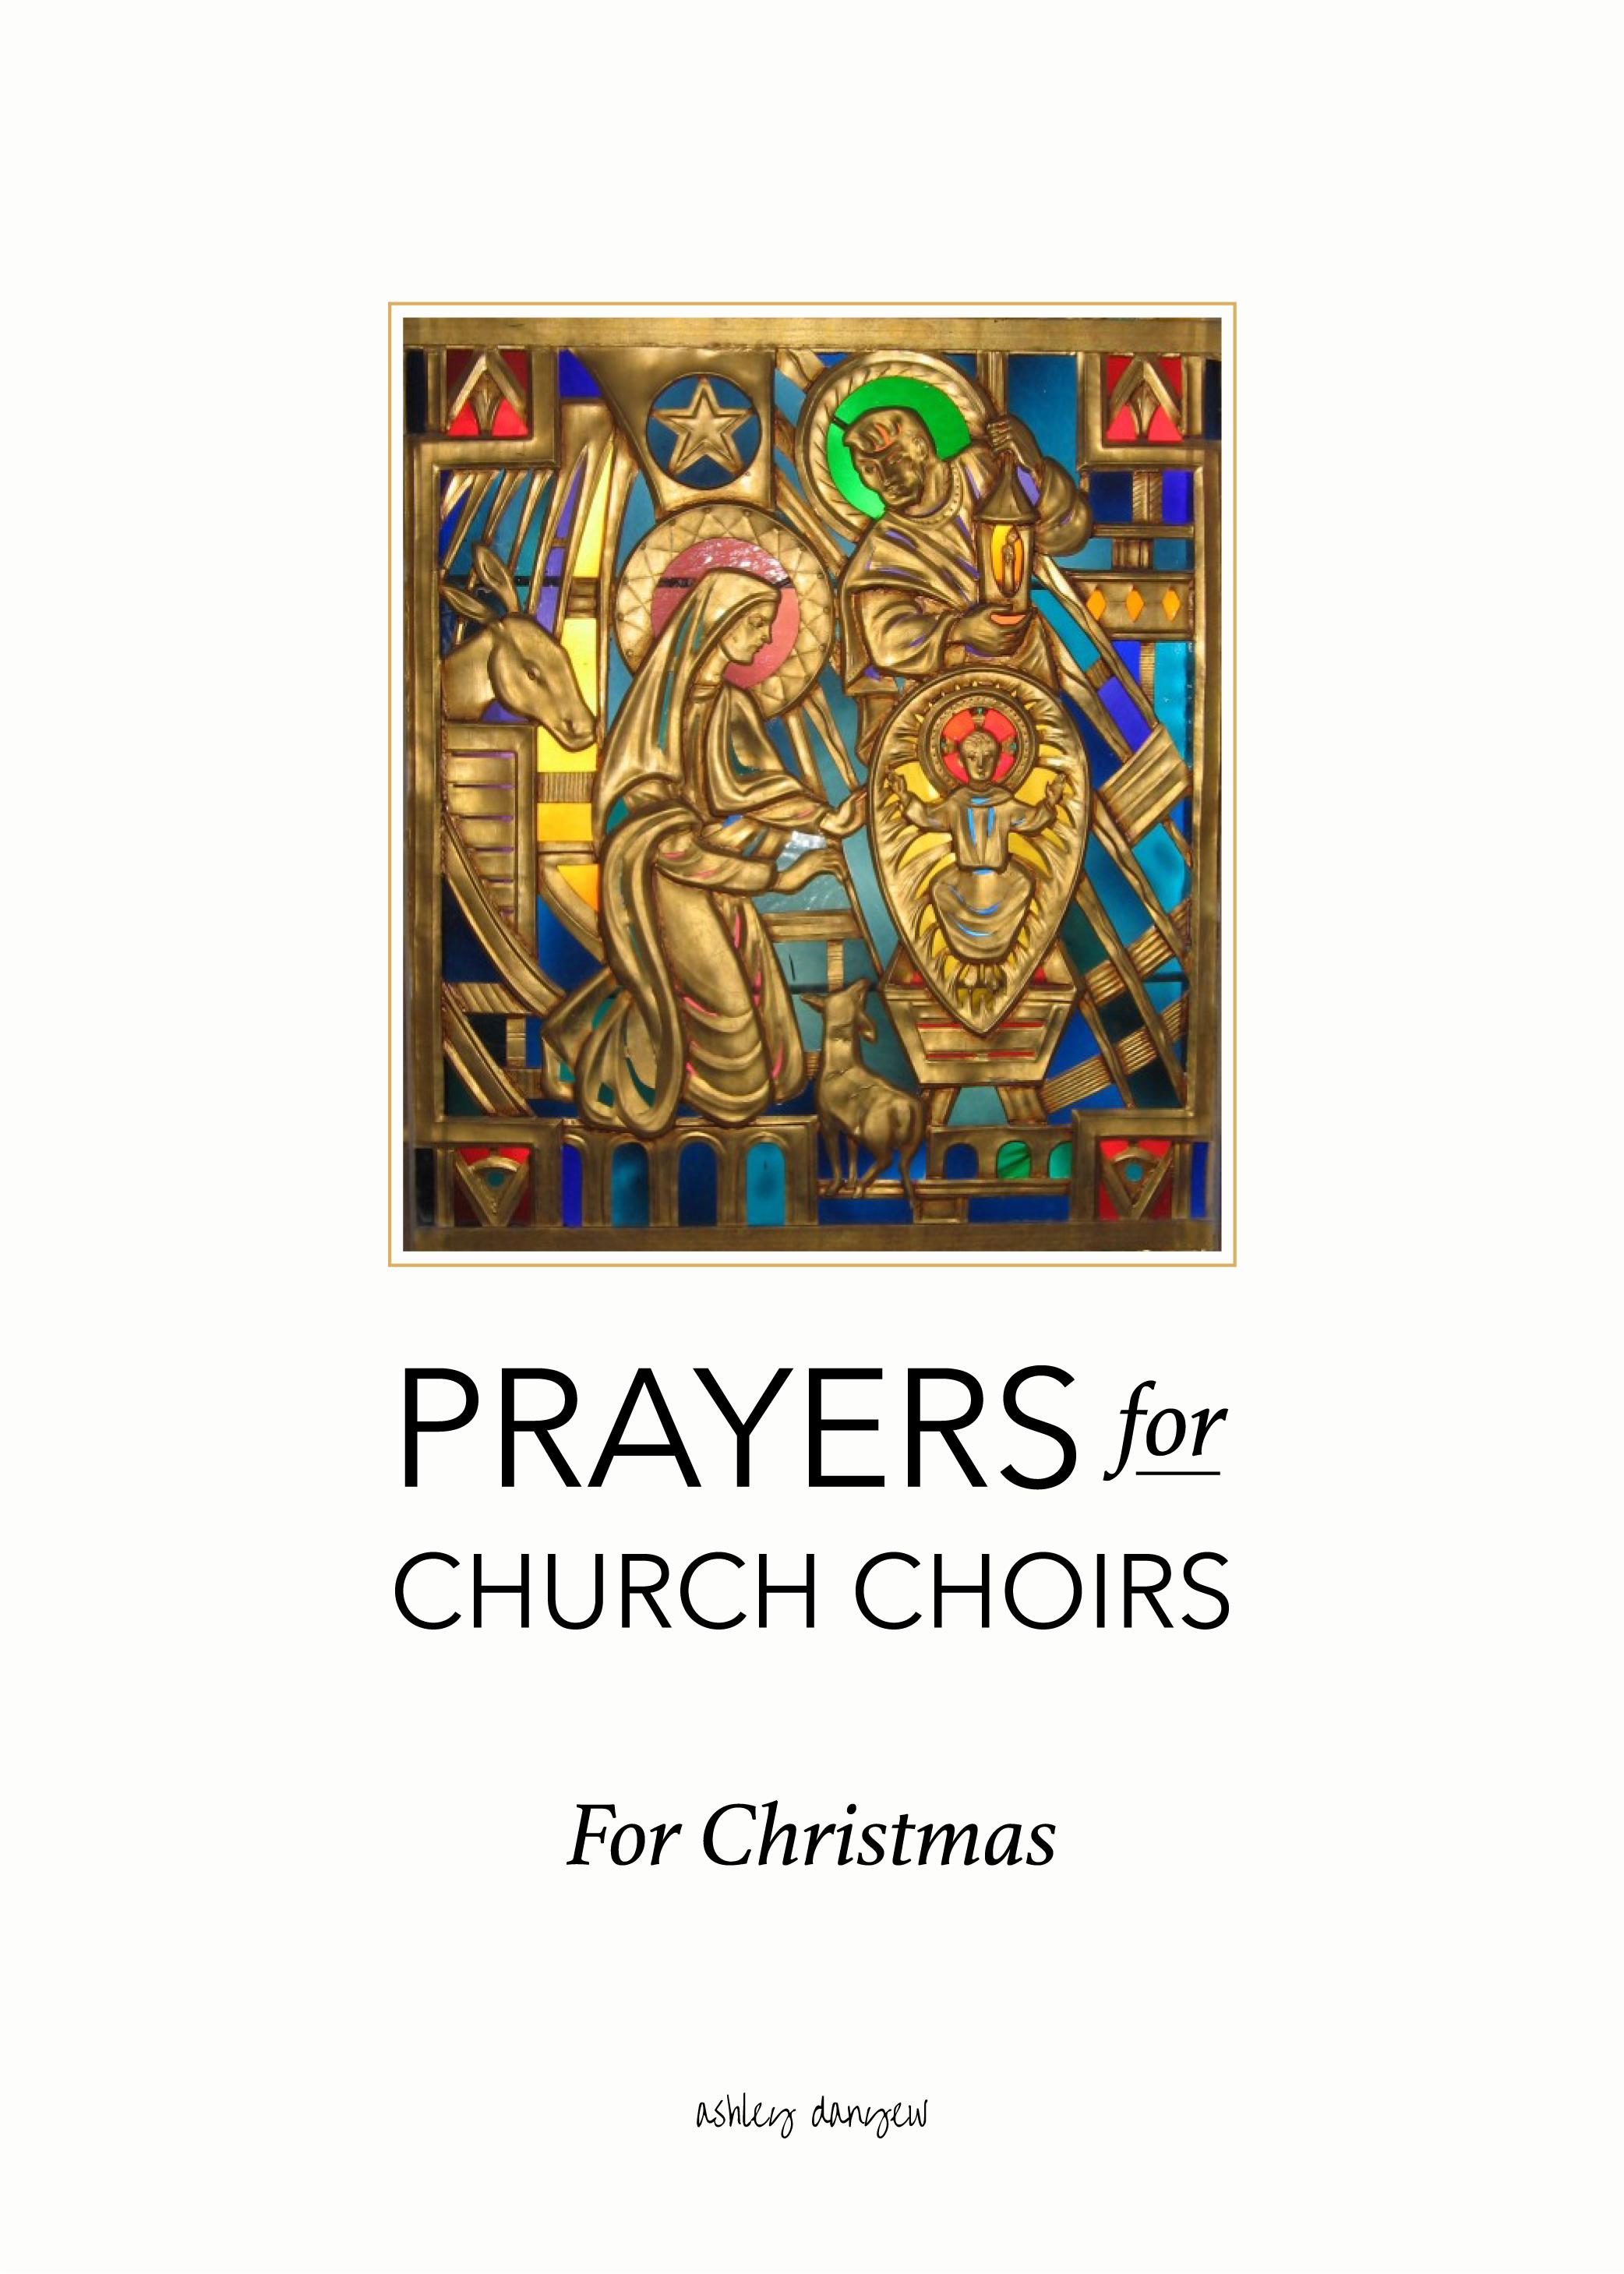 Prayers for Church Choirs: No. 12 - A short Christmas devotion and prayer for church choirs | @ashleydanyew